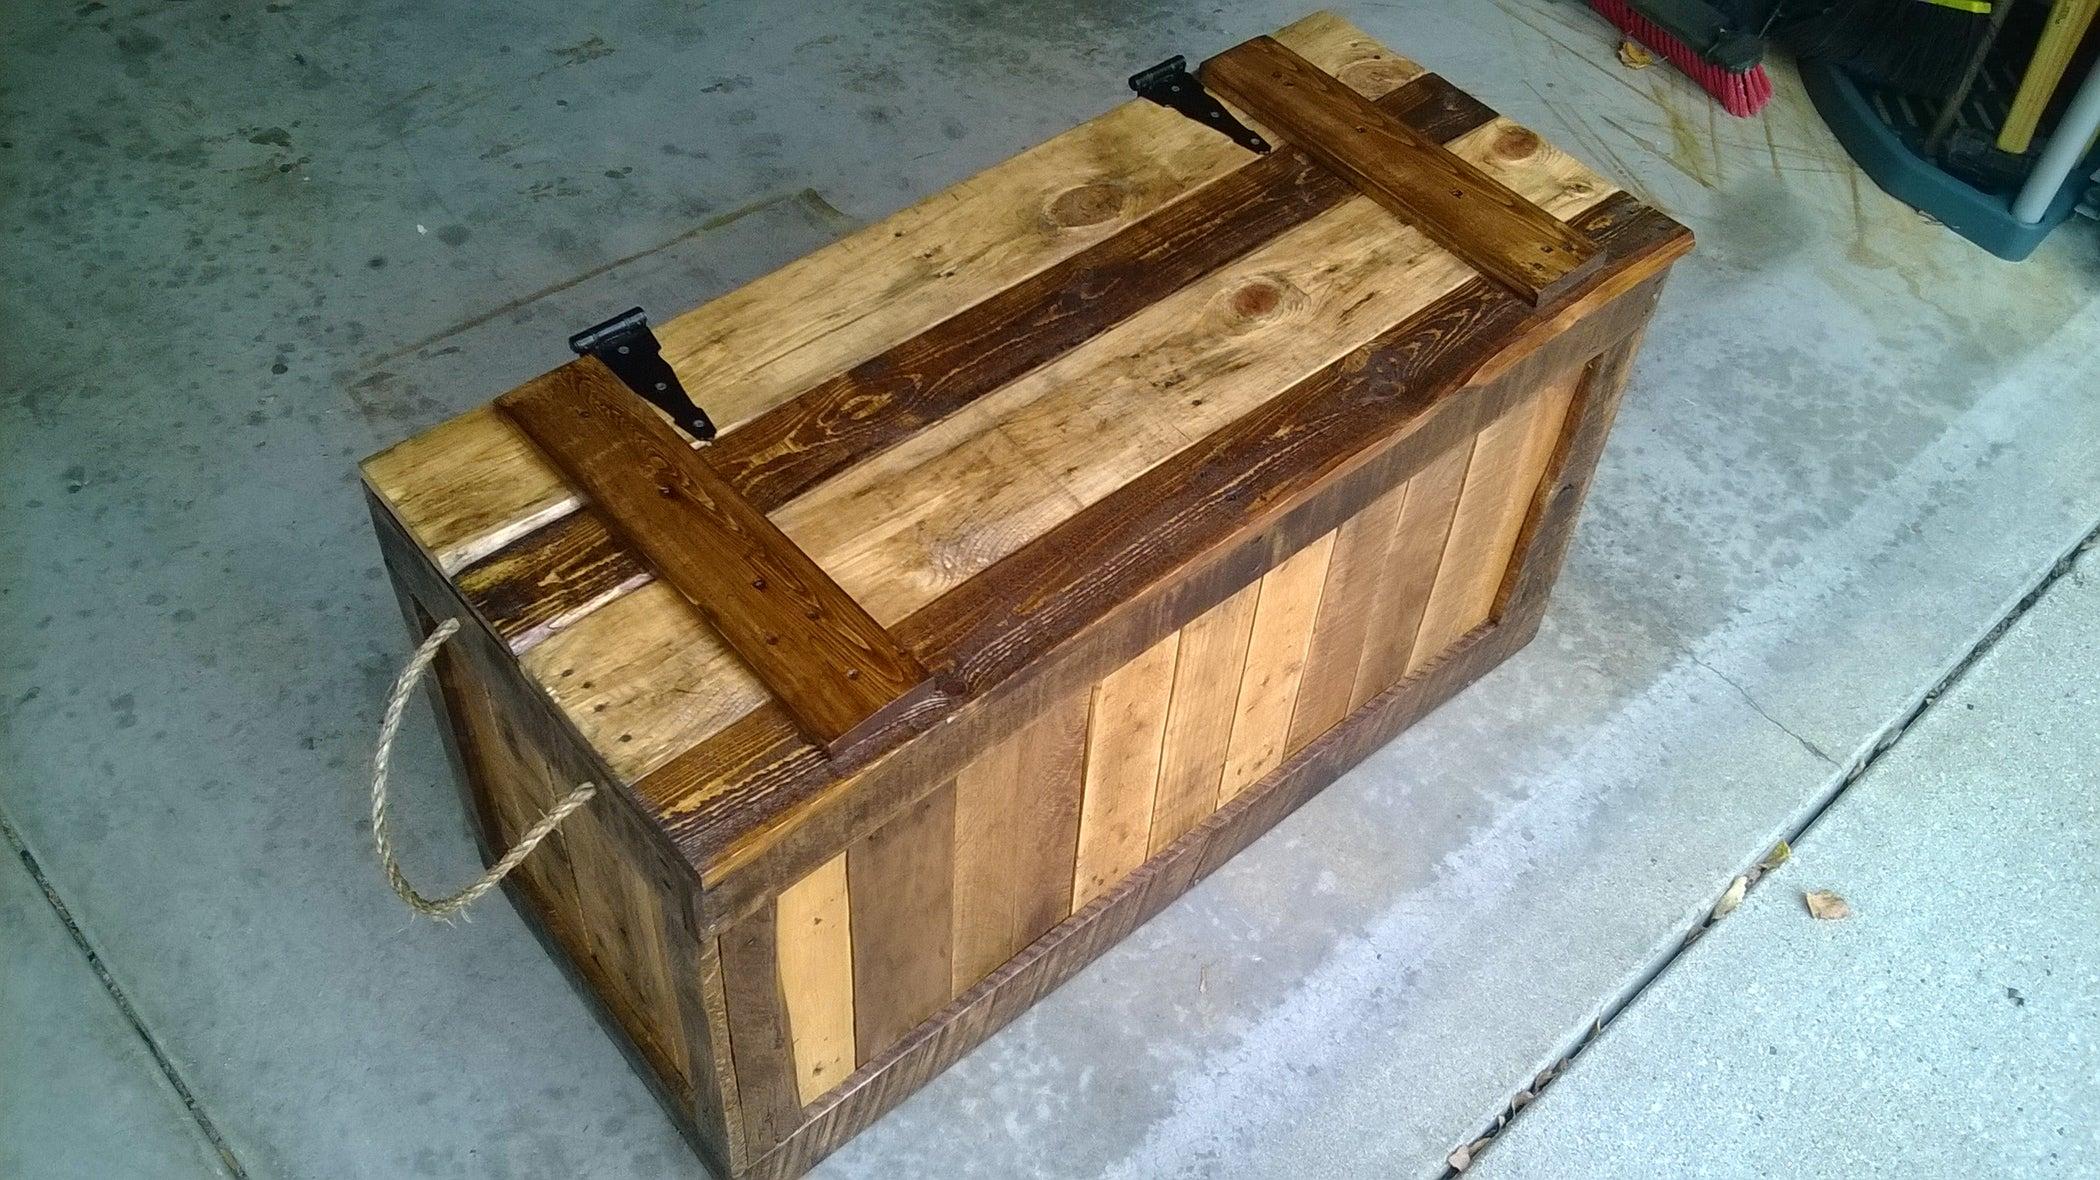 False Bottom Trunk From Reclaimed Wood Pallets 7 Steps